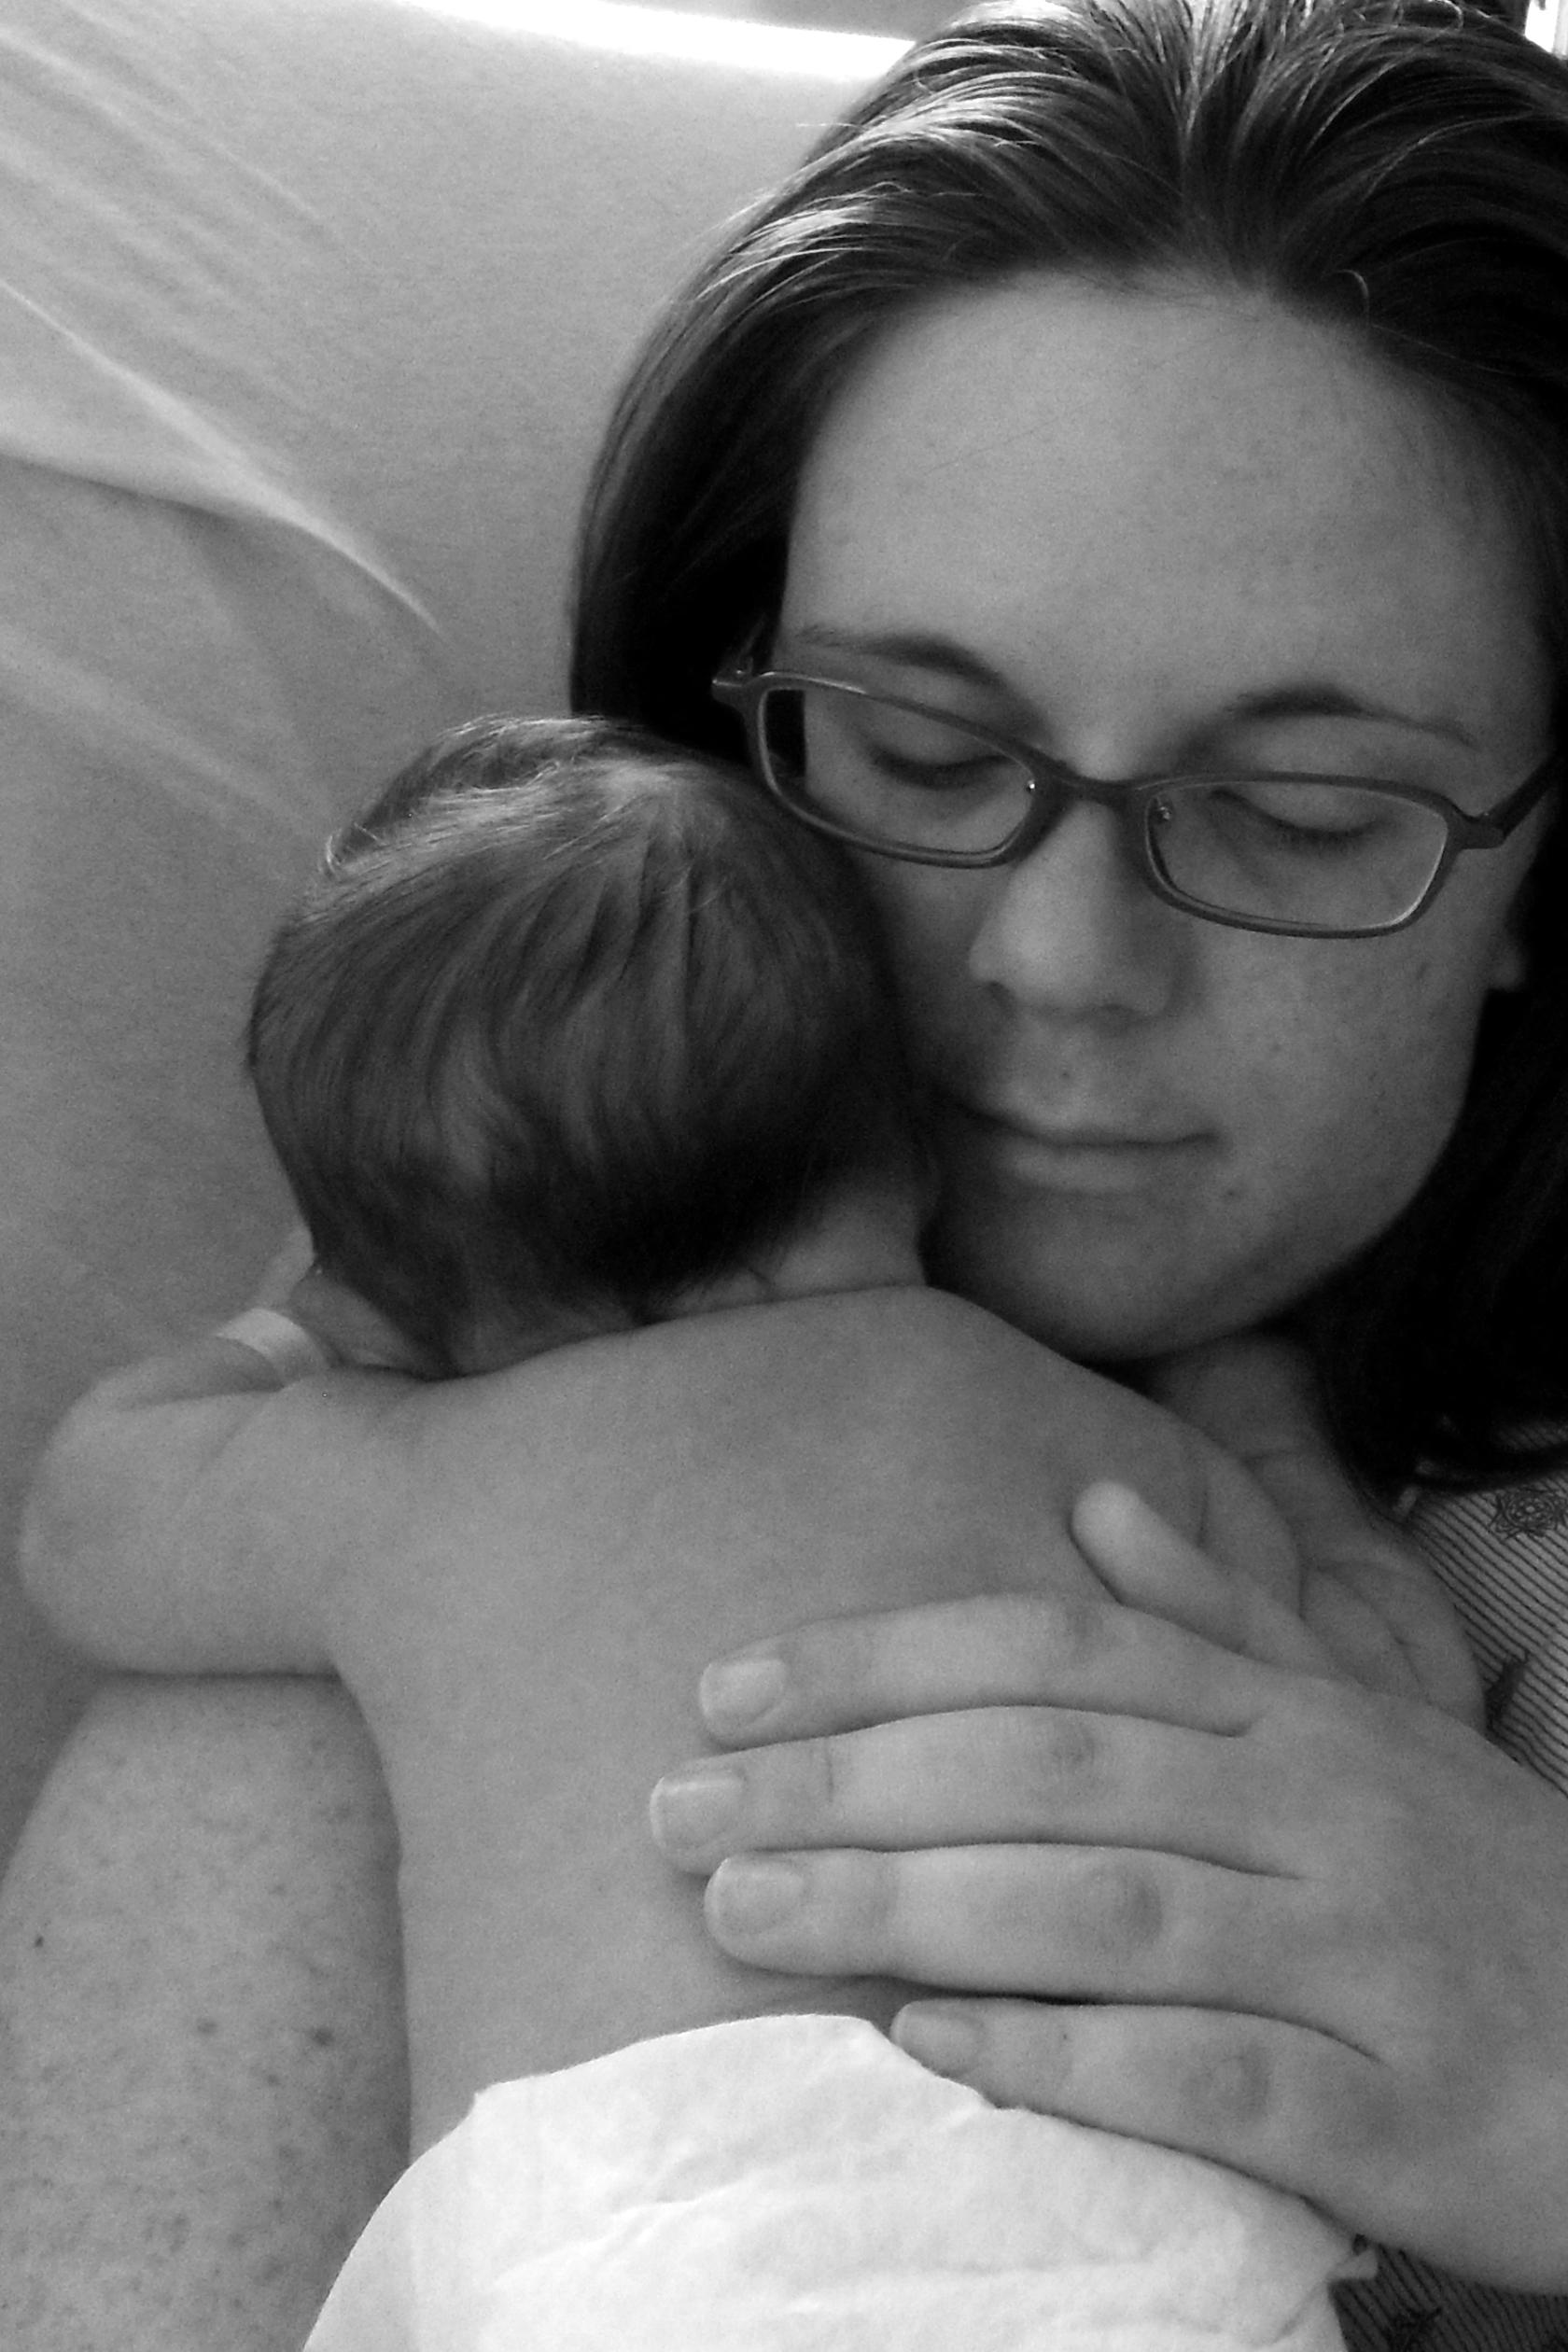 Mama and Baby BW